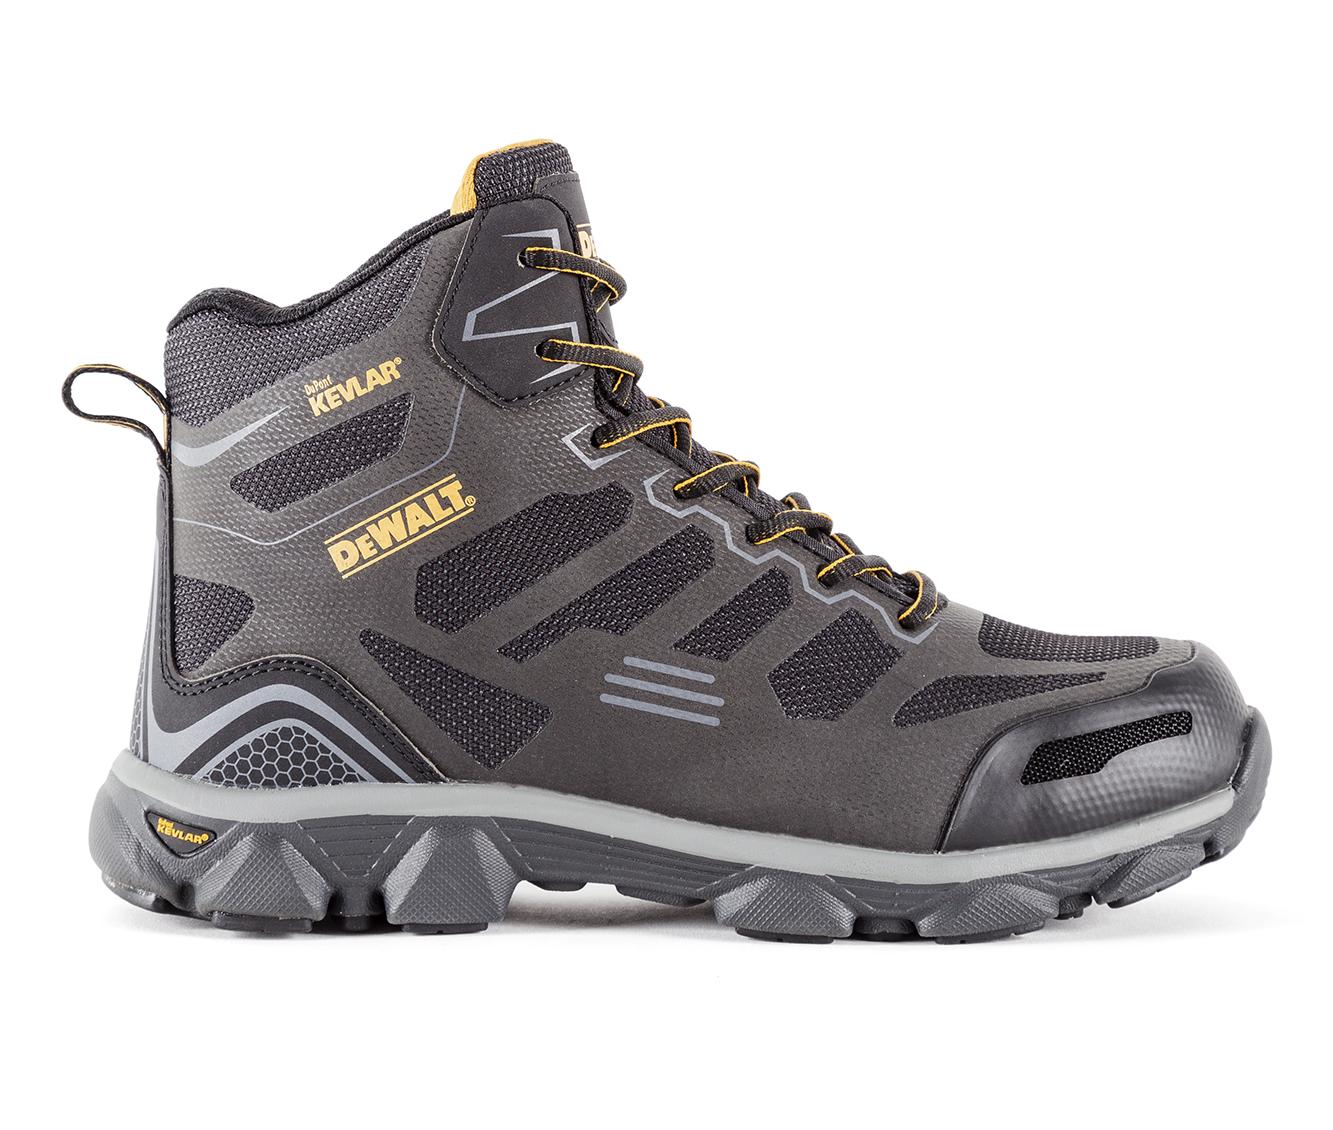 DeWALT Cross Fire Mid Men's Boots (Black Leather)